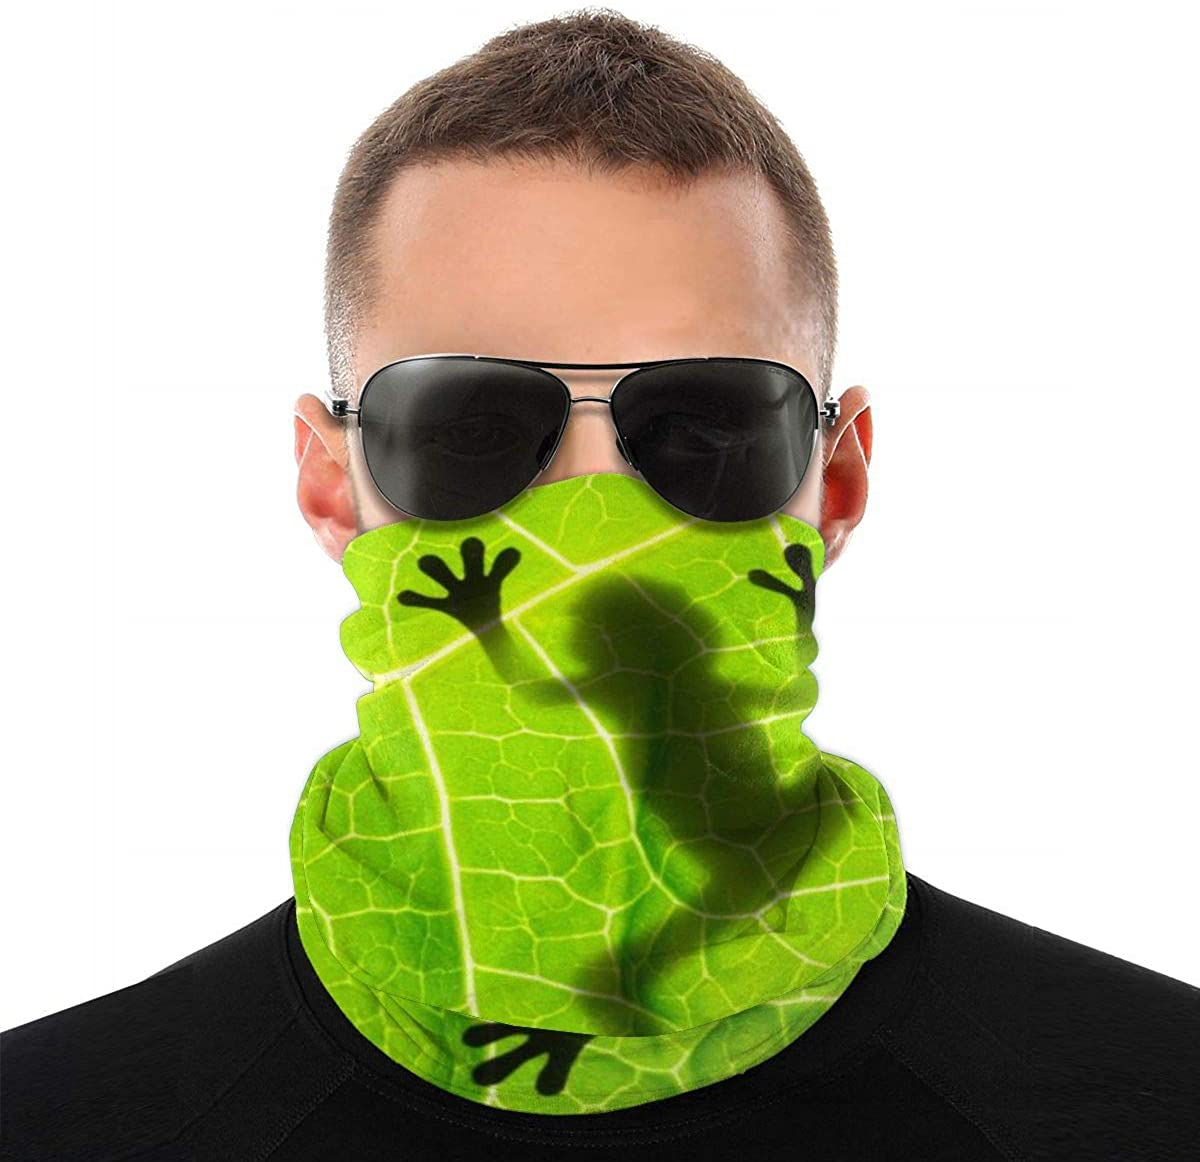 LOKIDVE Men's Blue Anchor Seamless Headscarf Sun Protection Neck Scarf Dustproof Balaclavas